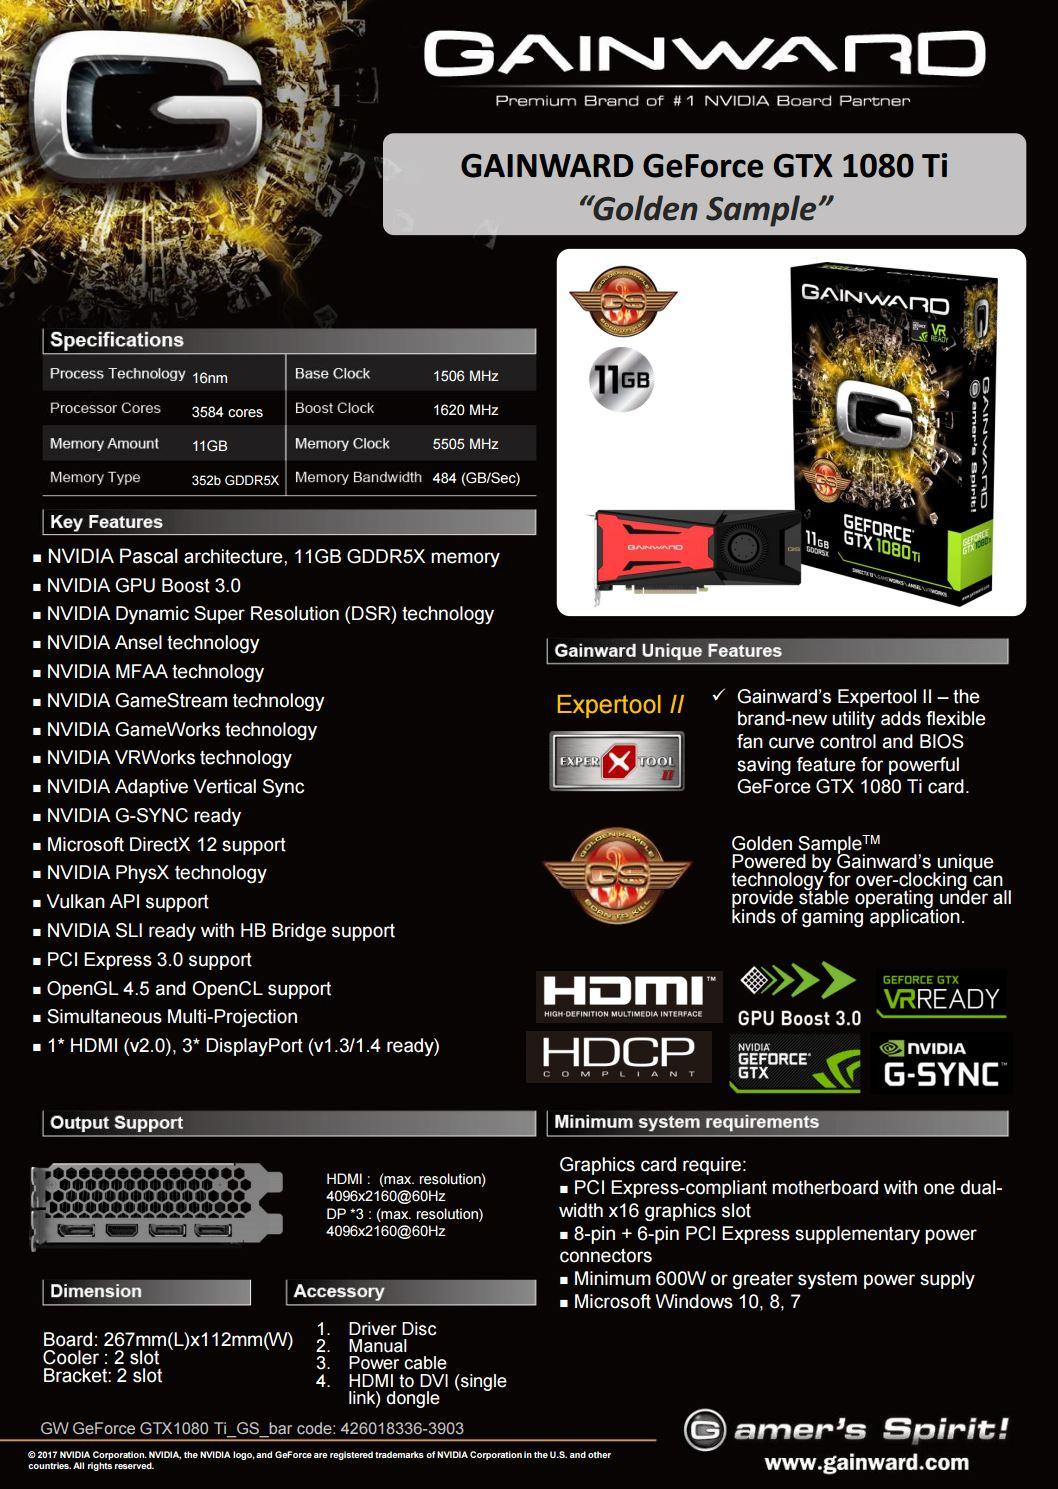 Gainward launches GeForce GTX 1080 Ti Golden Sample